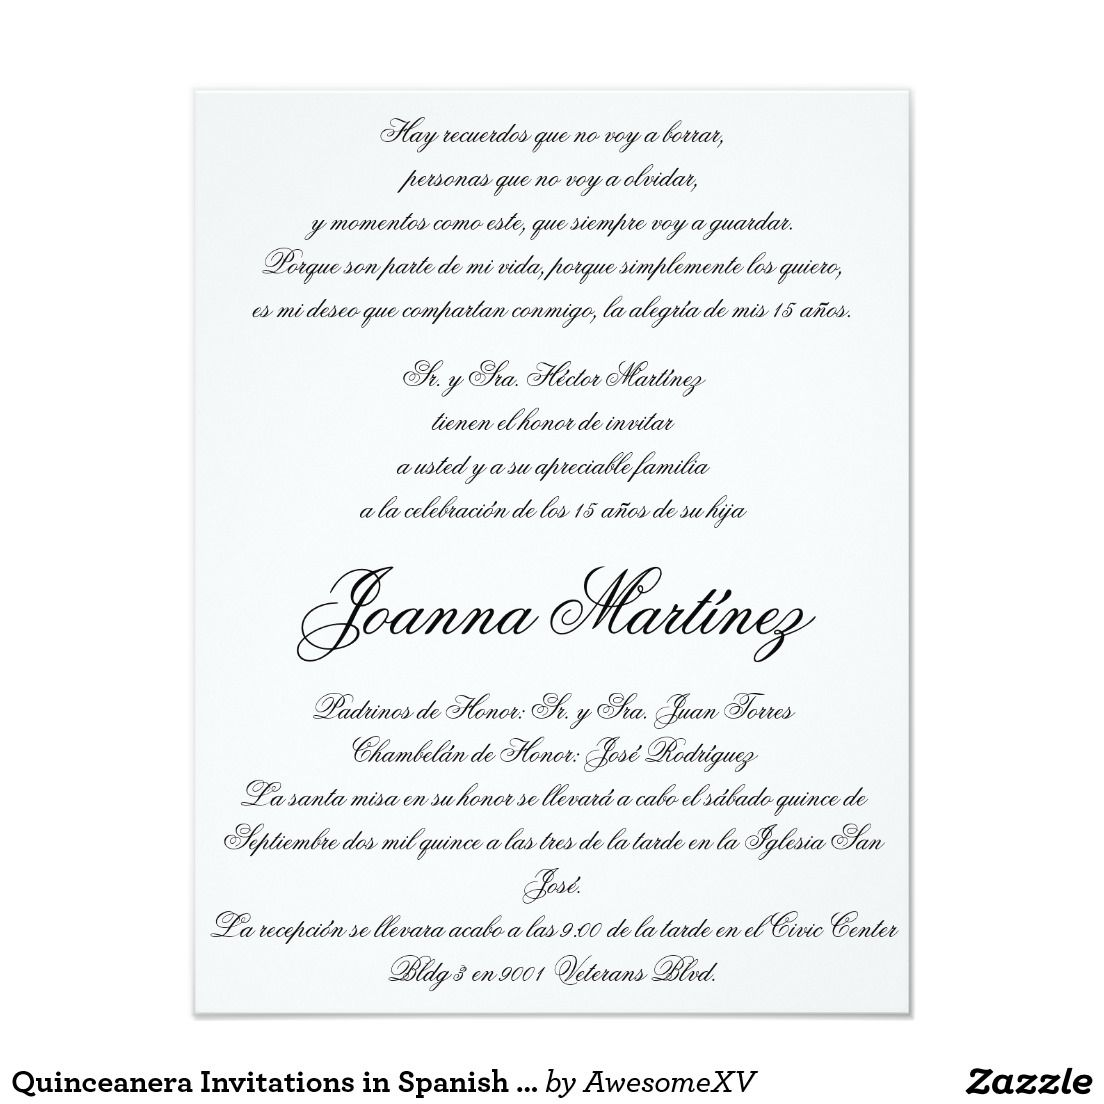 Wedding Invitation Wording Samples In Spanish: Quinceanera Invitations In Spanish 4.25 X 5.5